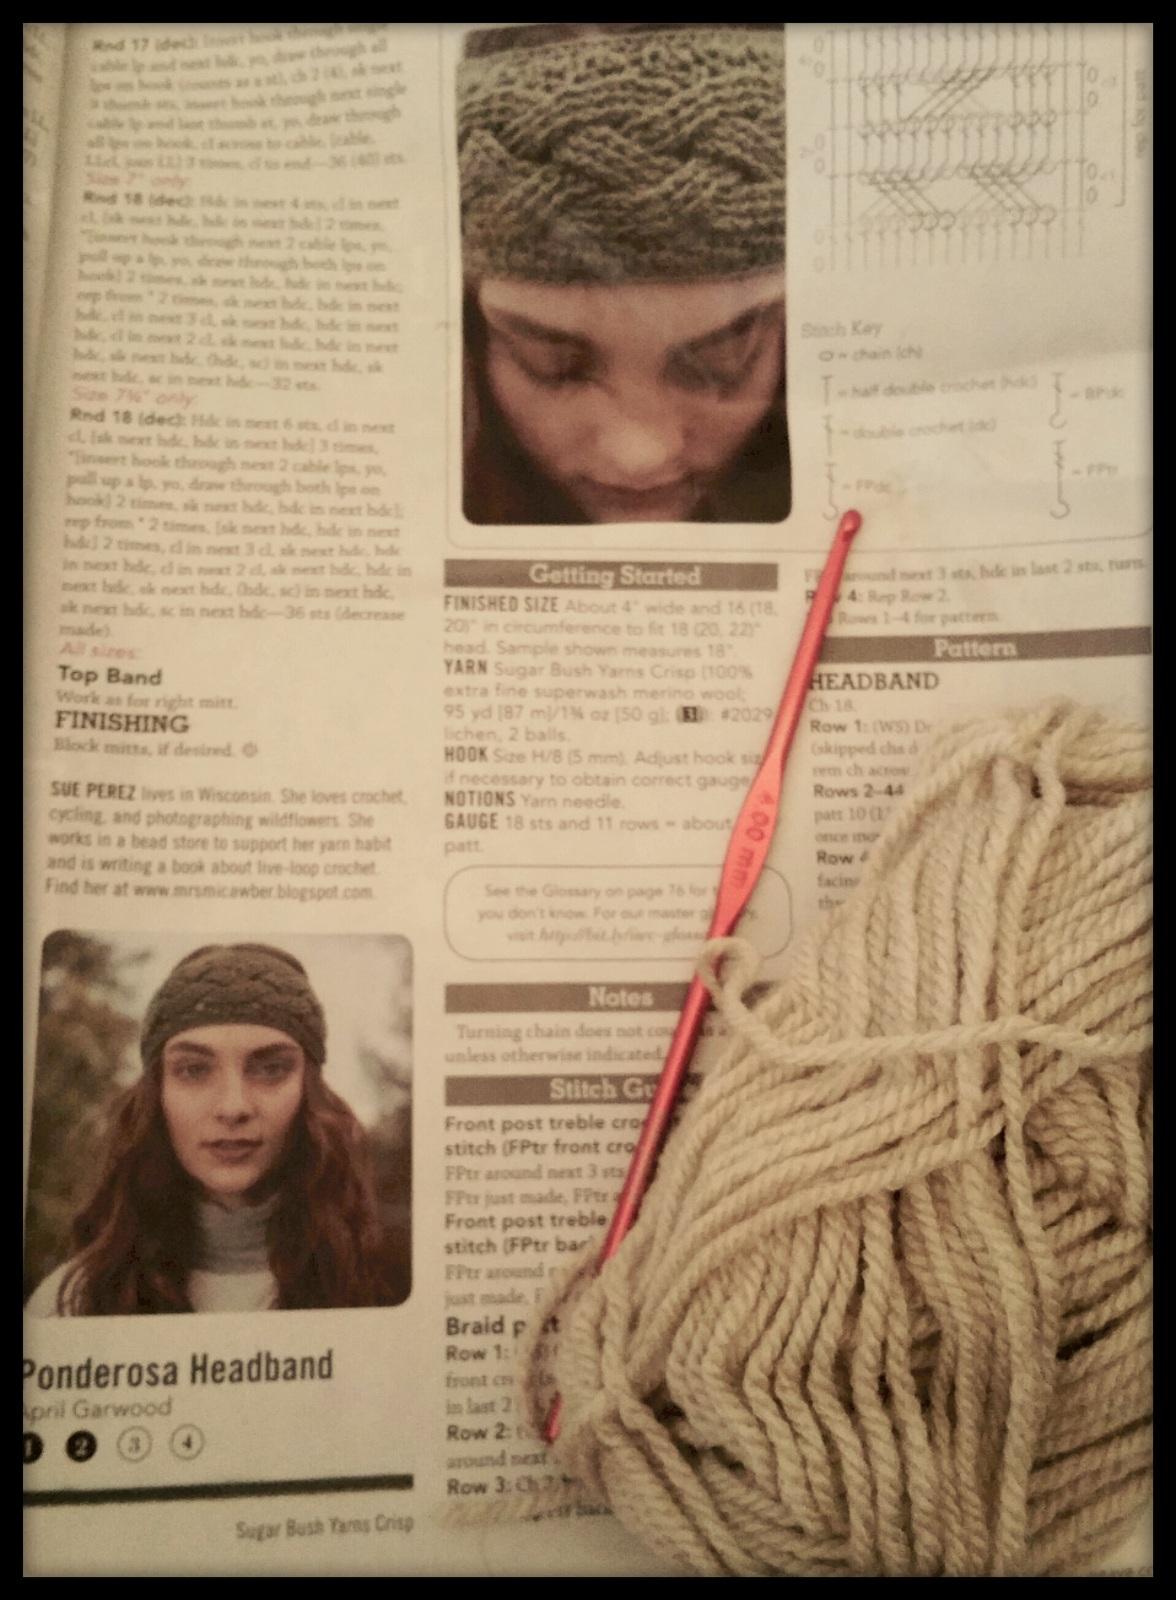 Ponderosa Headband